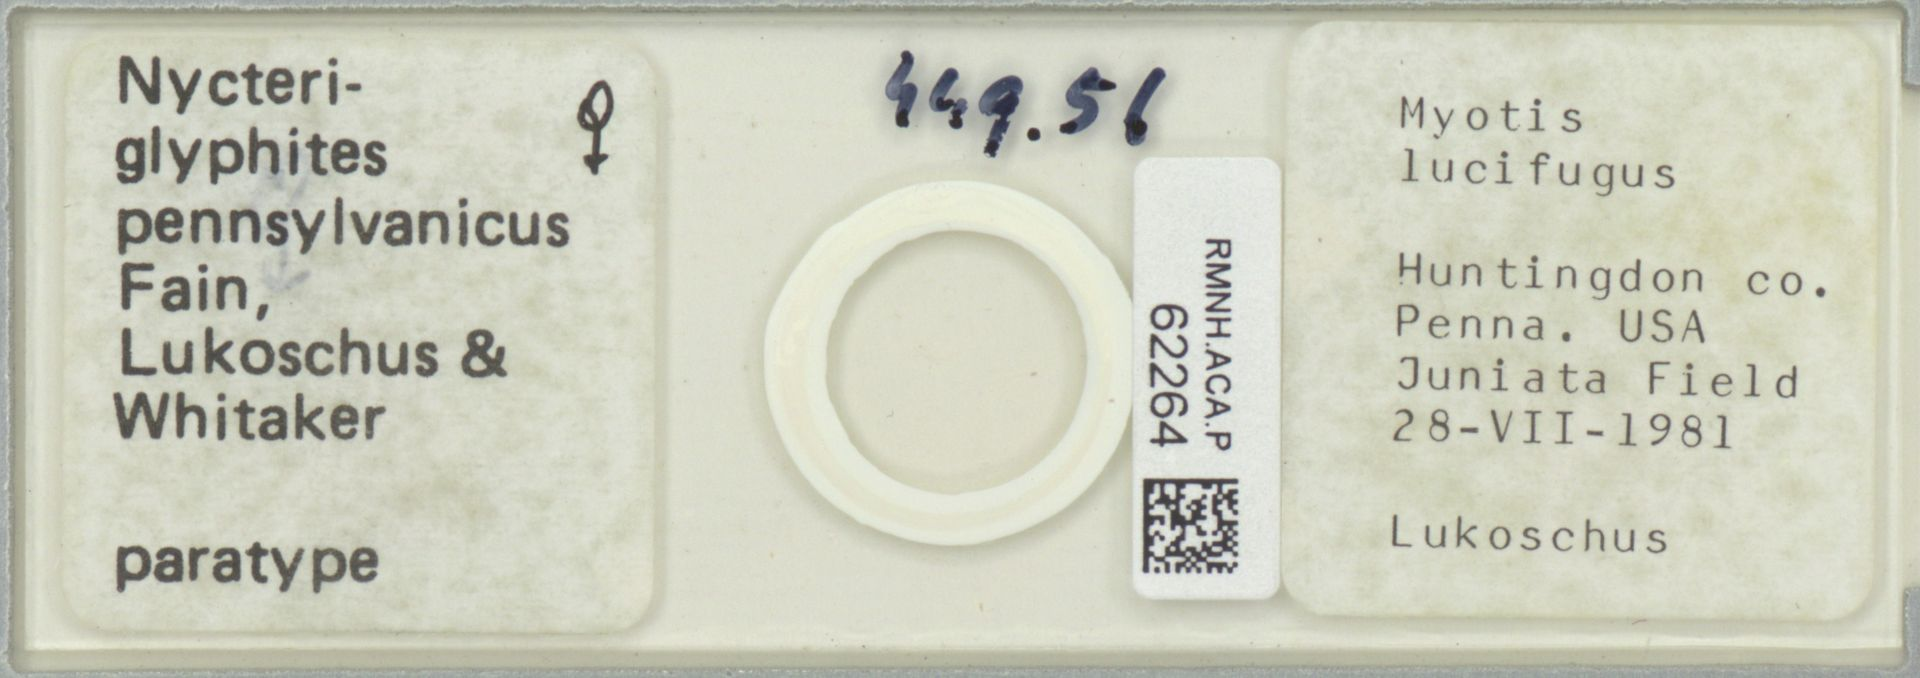 RMNH.ACA.P.62264 | Nycteriglyphites pennsylvanicus Fain, Lukoschus & Whitaker